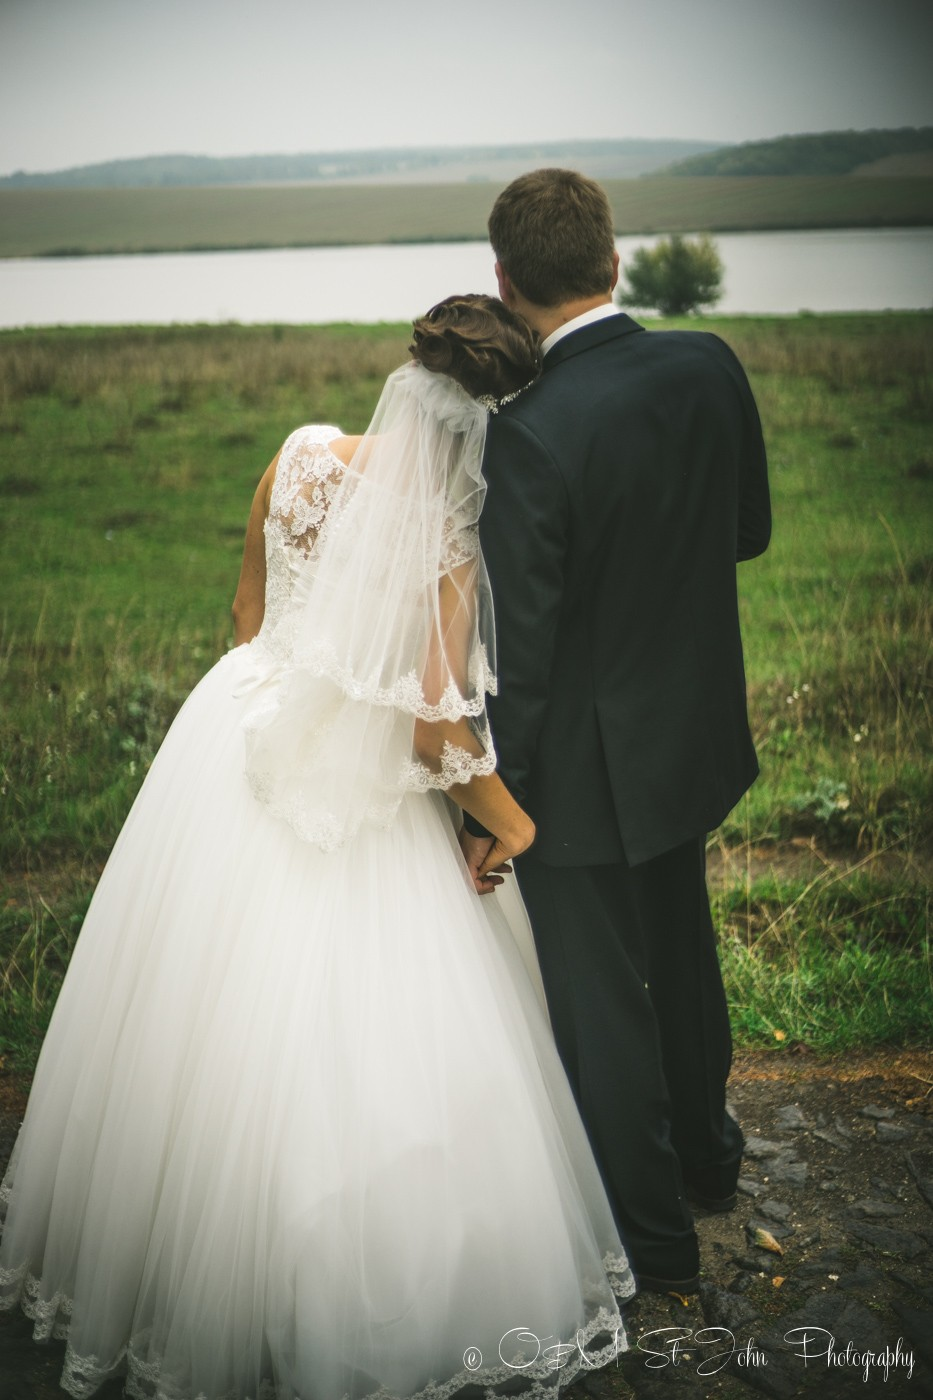 Cousins Wedding In Ukraine Bride And Groom